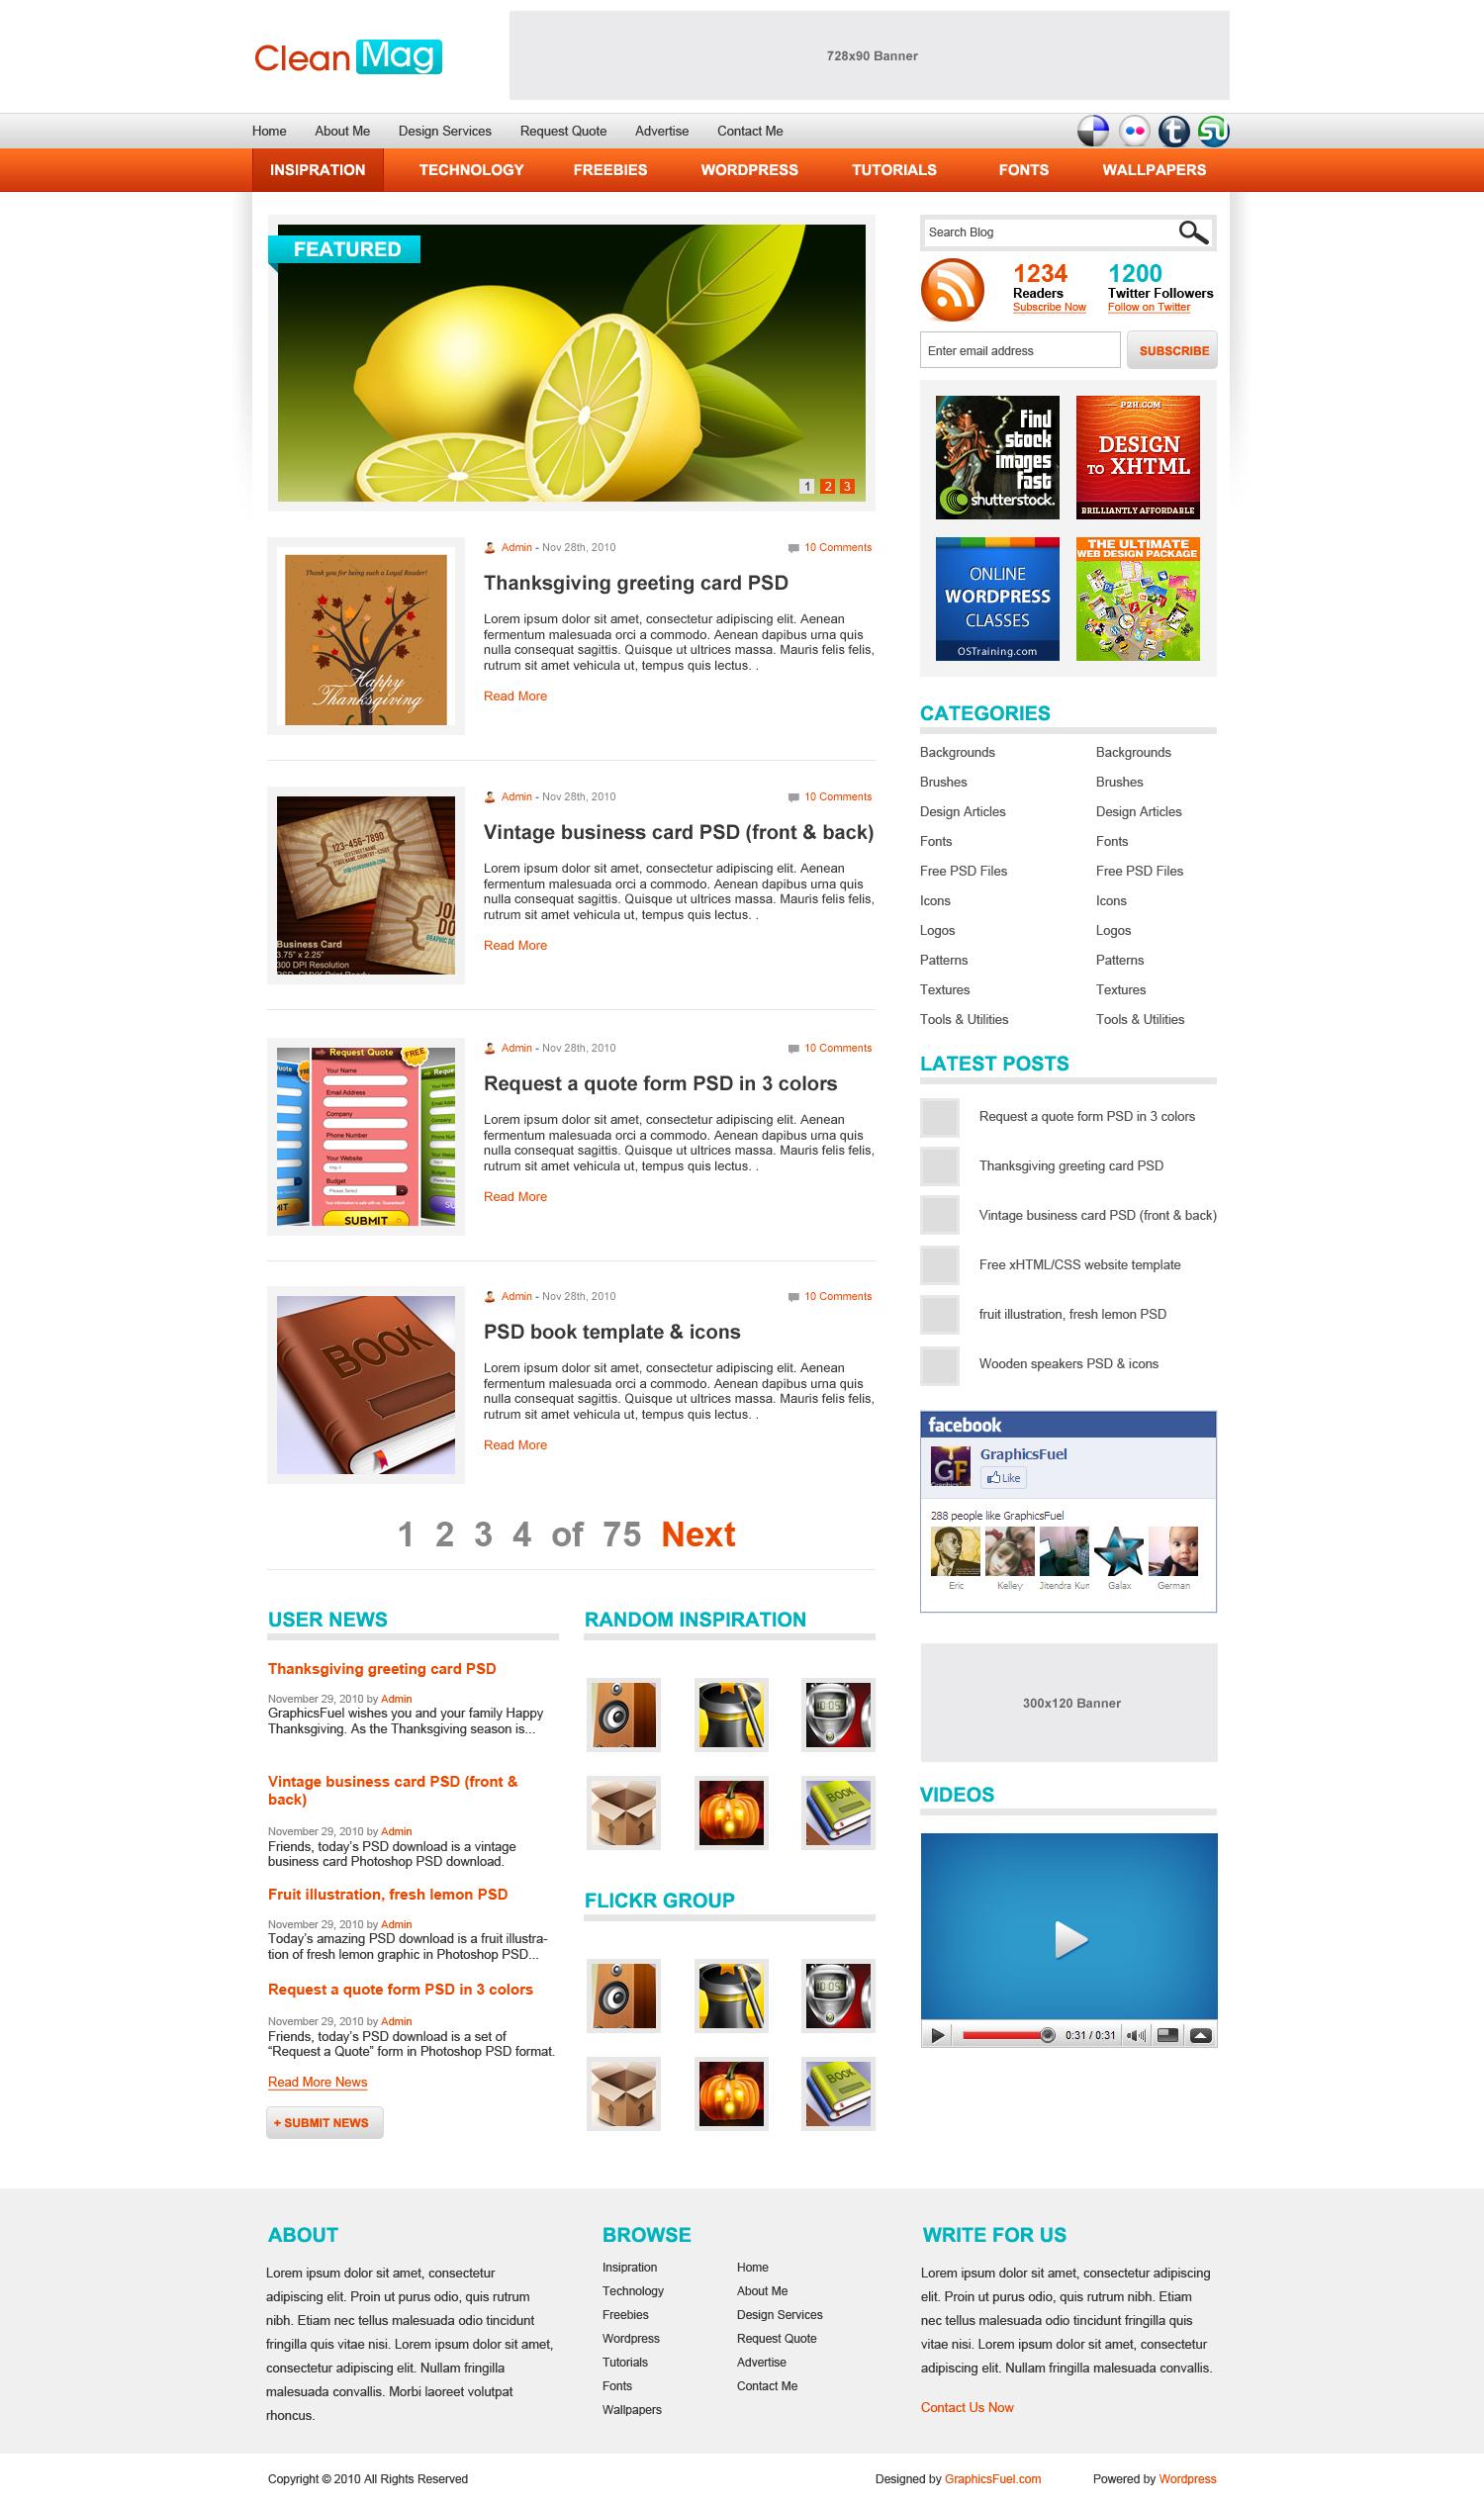 CommentLuv Premium para blogs de WordPress